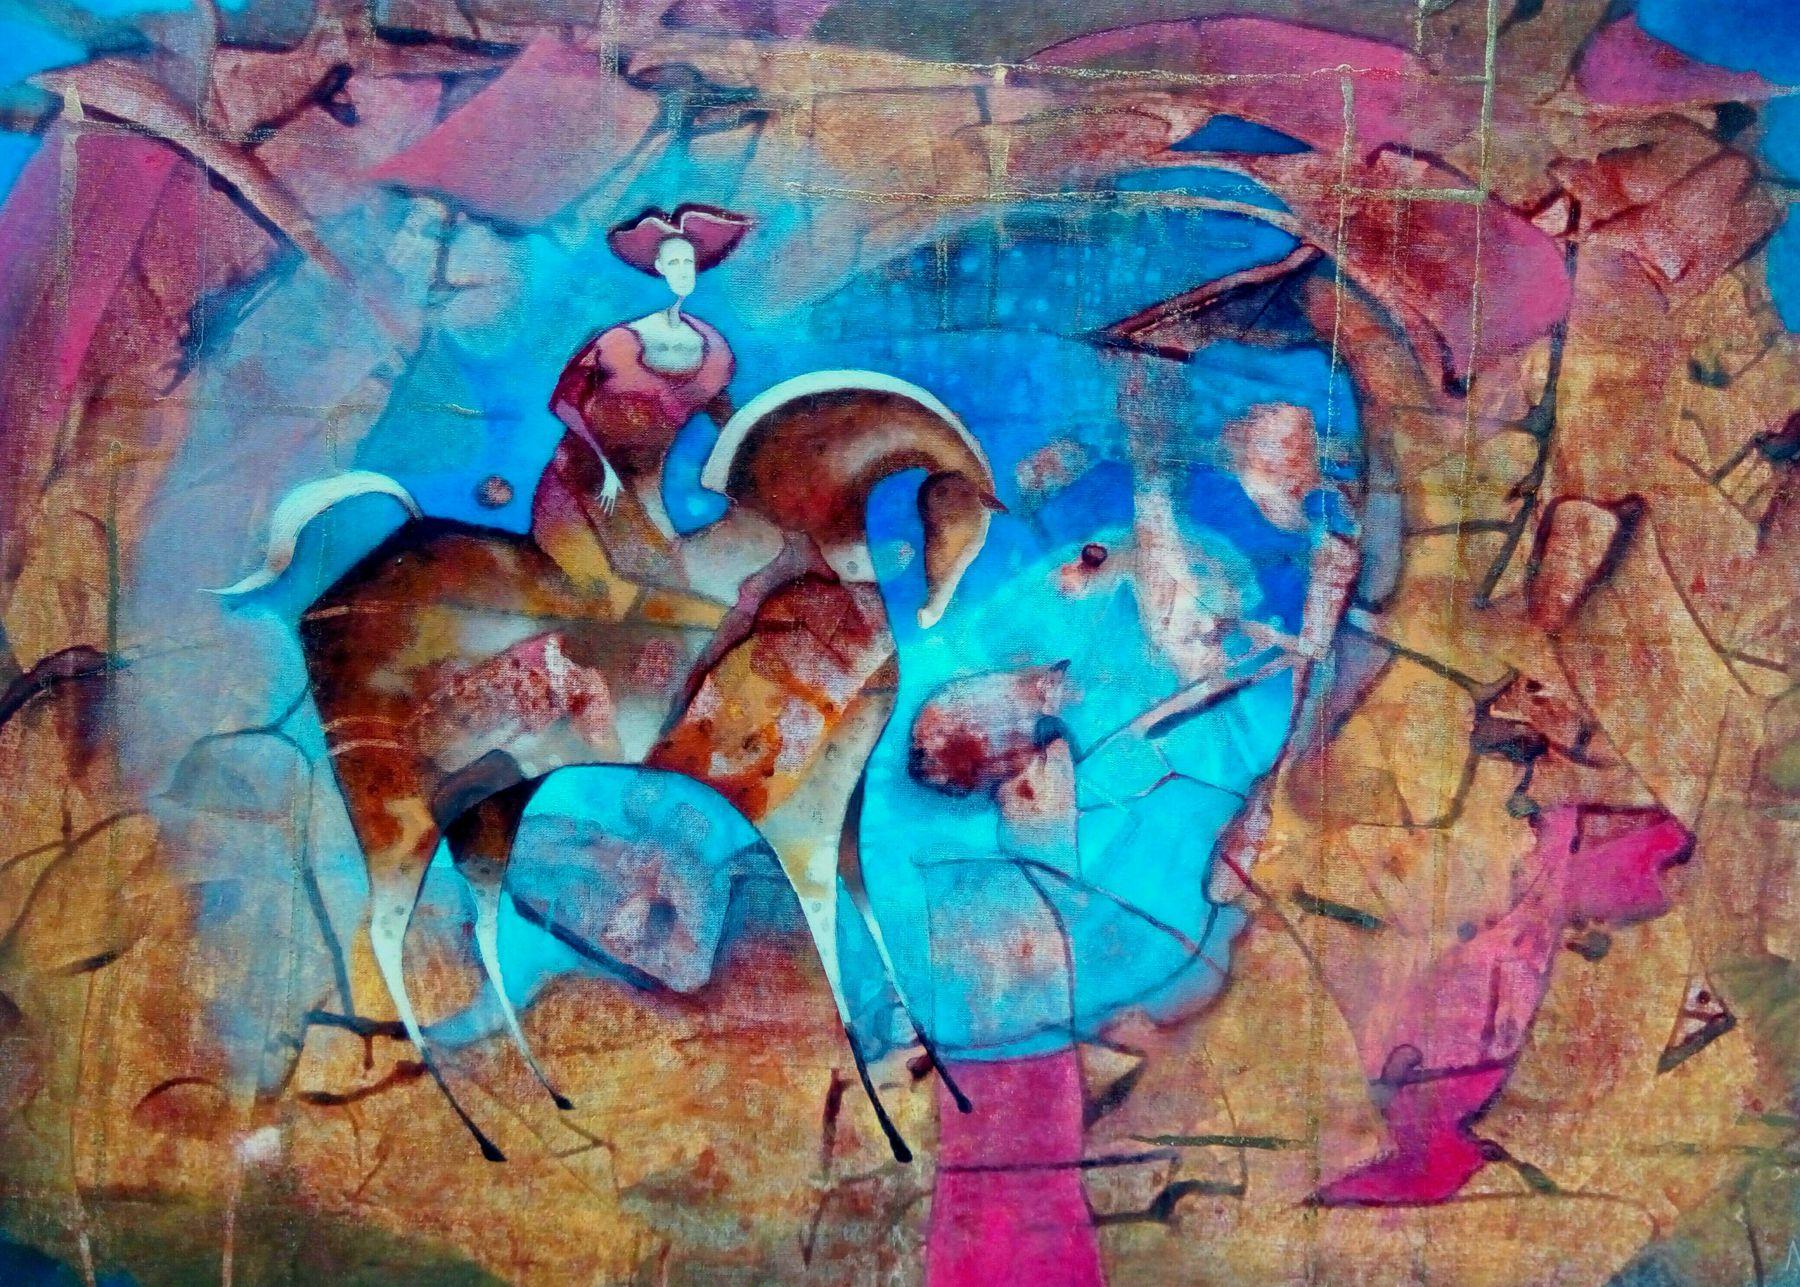 Norbert Judt – Modrý sen, kombinovaná technika na plátne, 2017